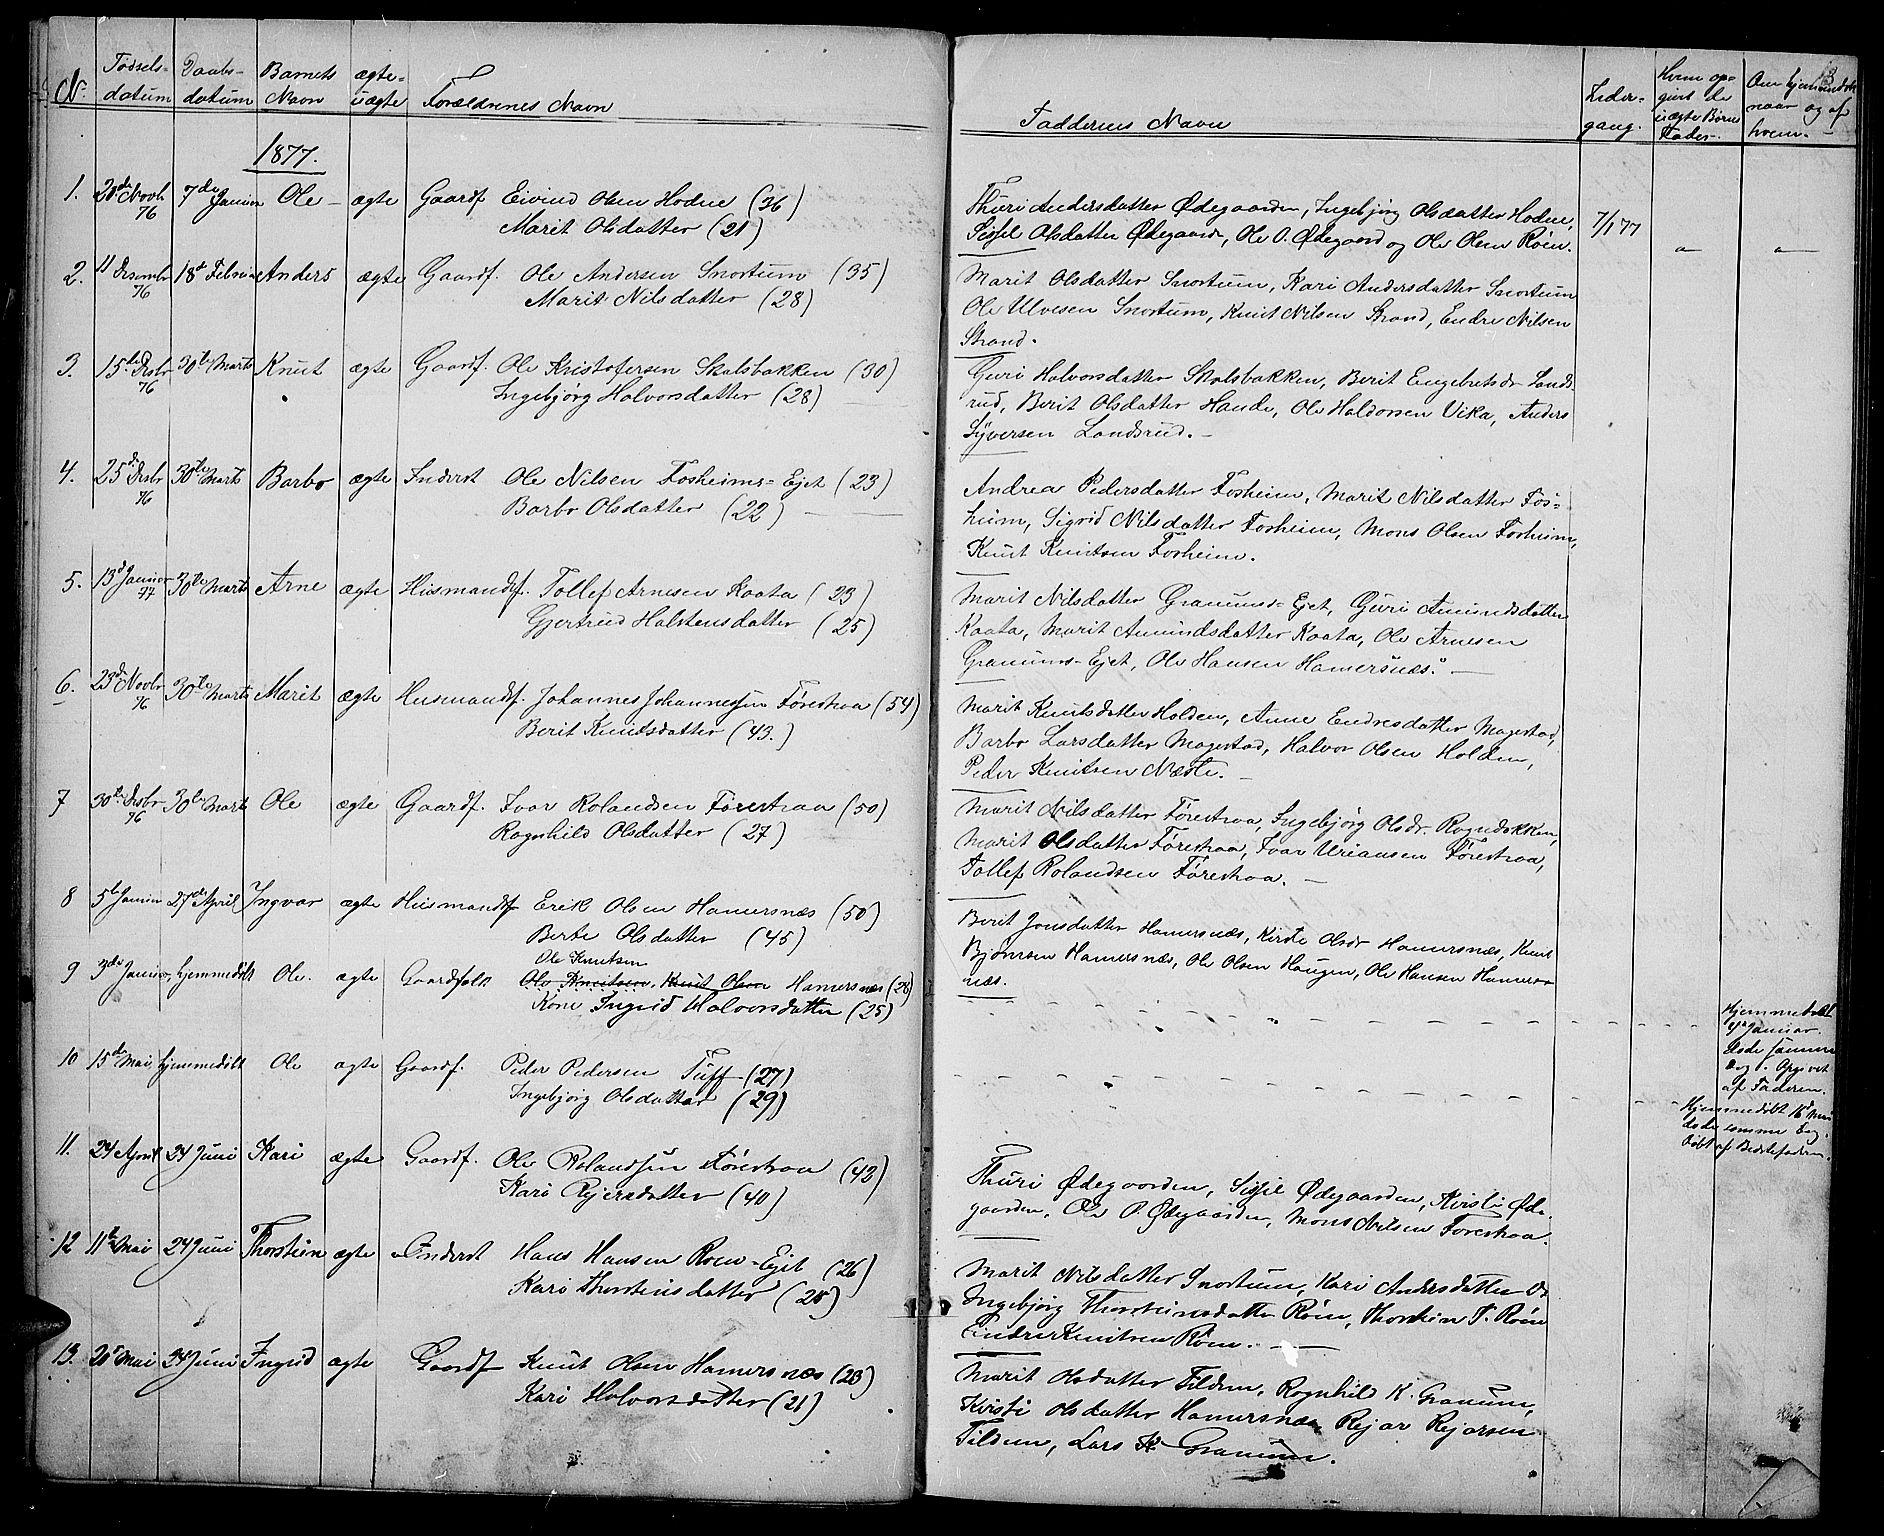 SAH, Vestre Slidre prestekontor, Klokkerbok nr. 3, 1869-1882, s. 18